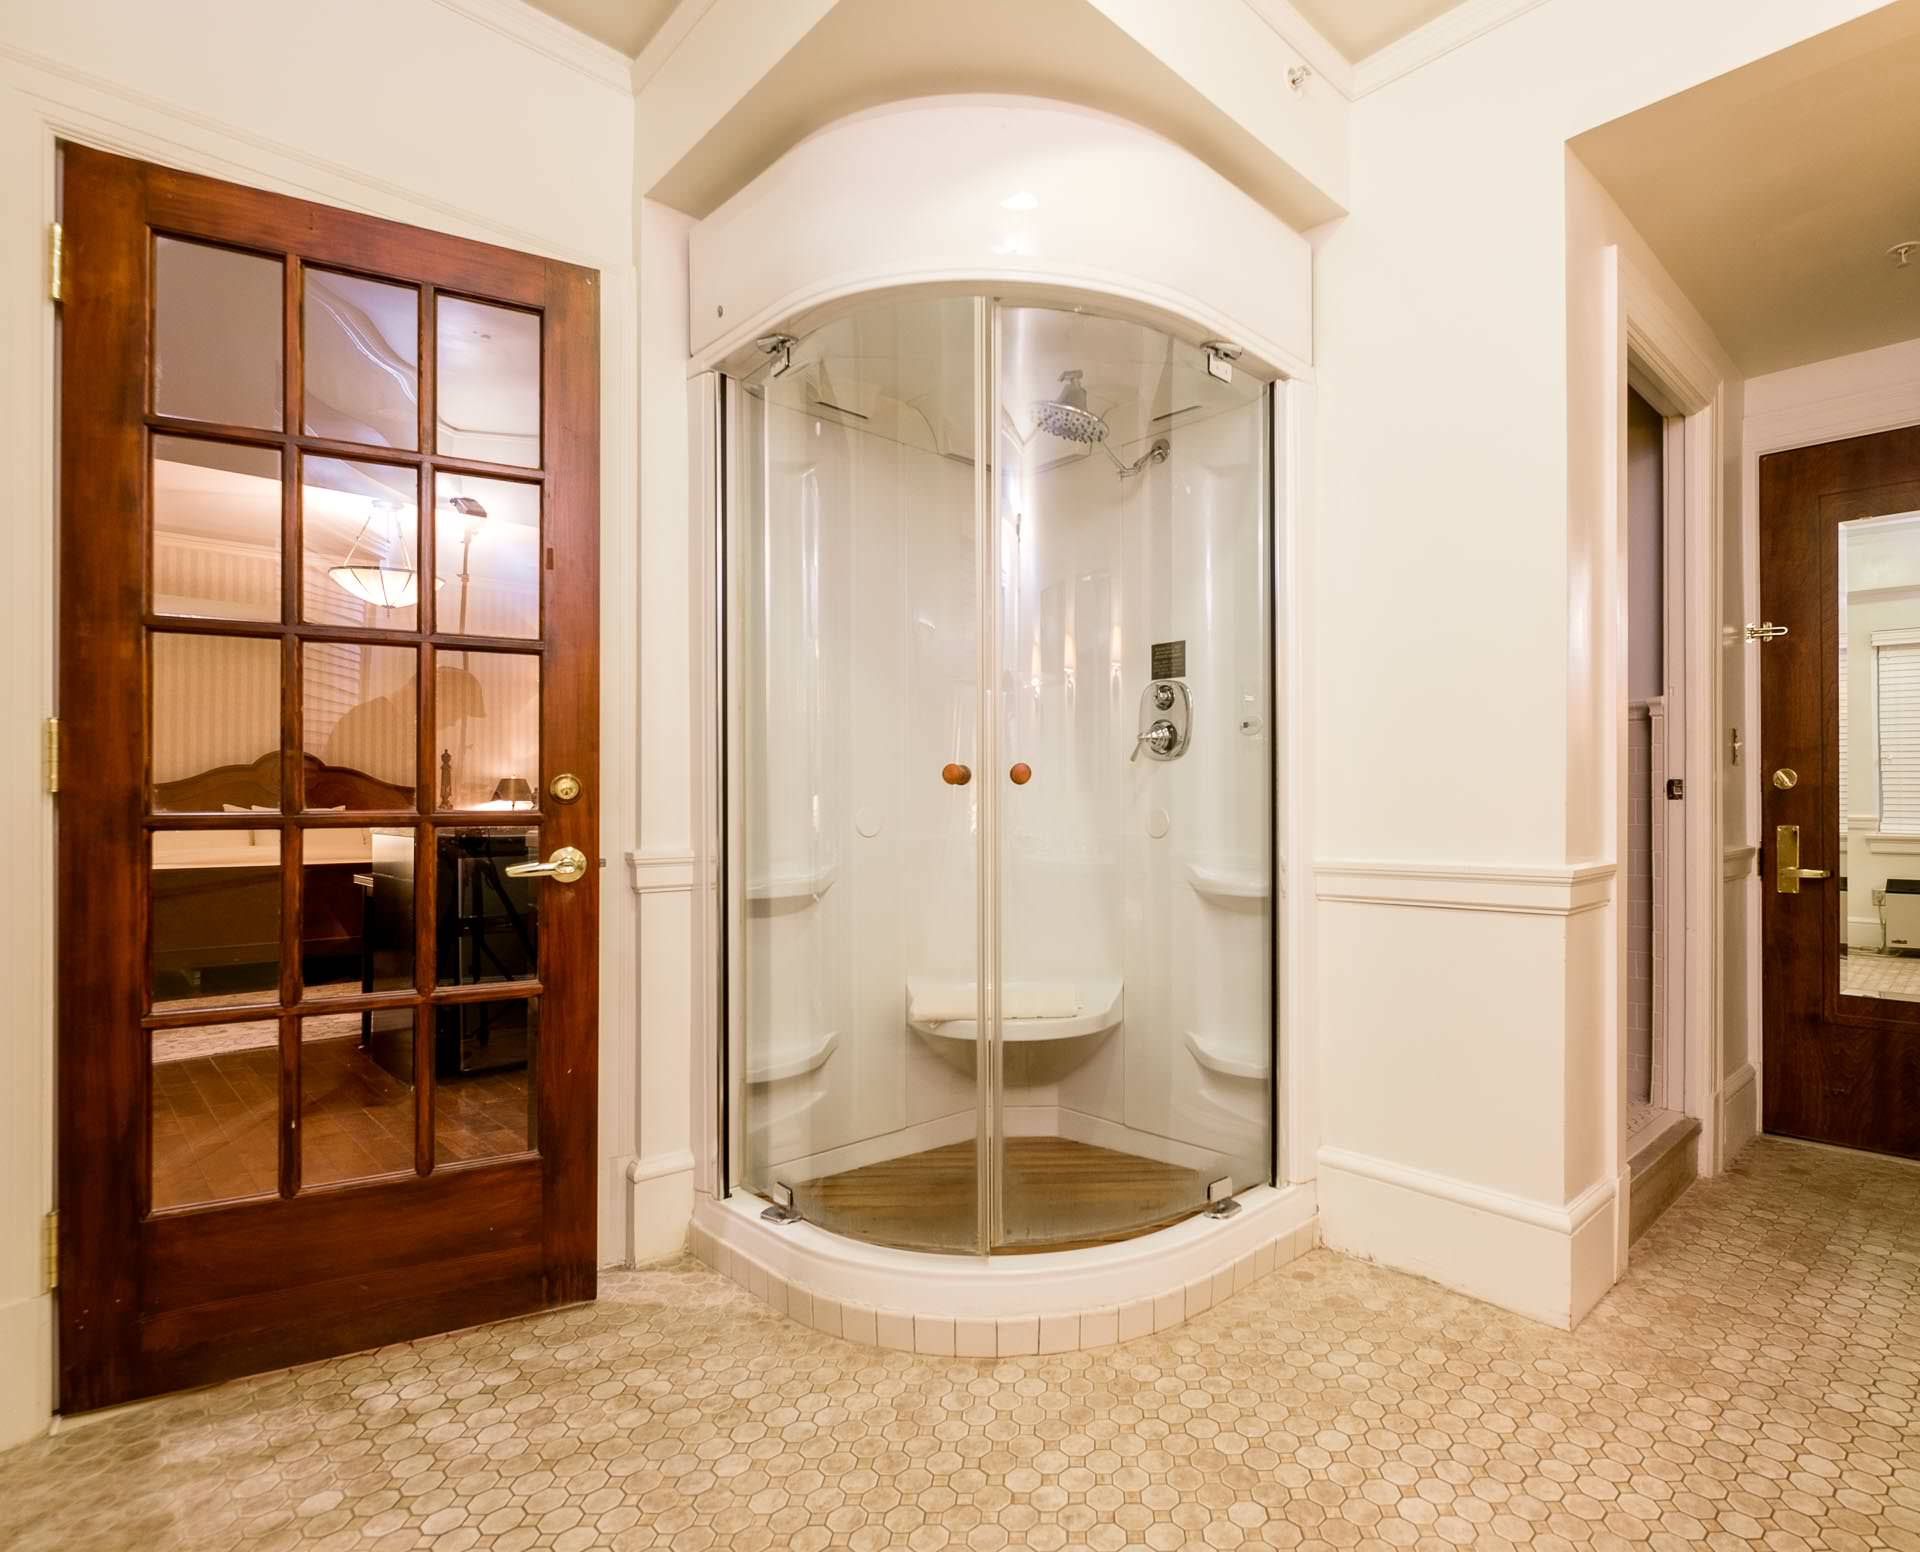 1119 Shower and Bedroom.jpg